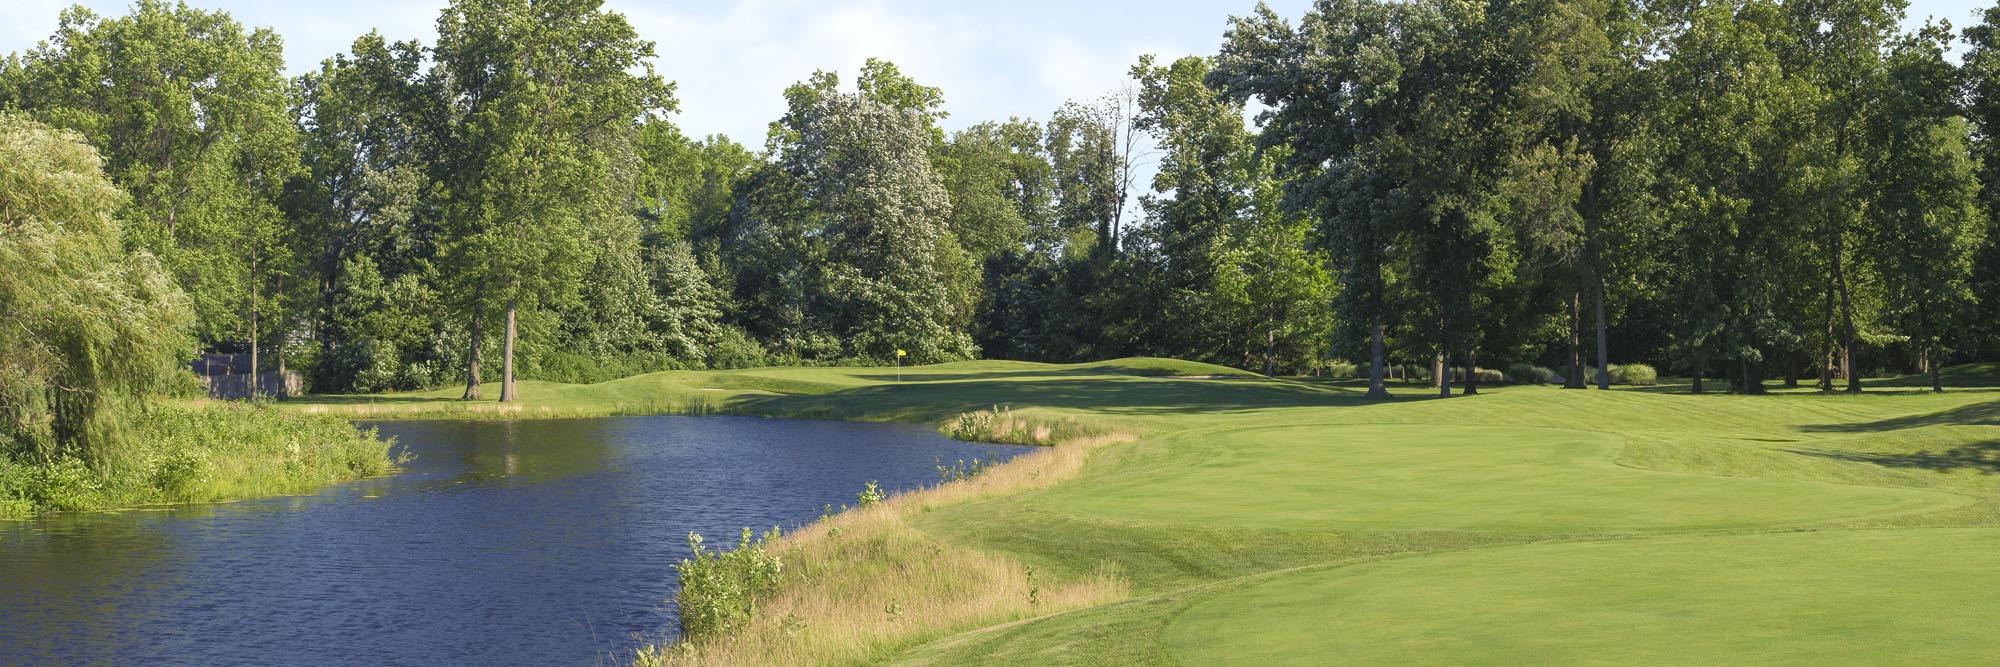 Golf Course Image - Jefferson Country Club No. 12